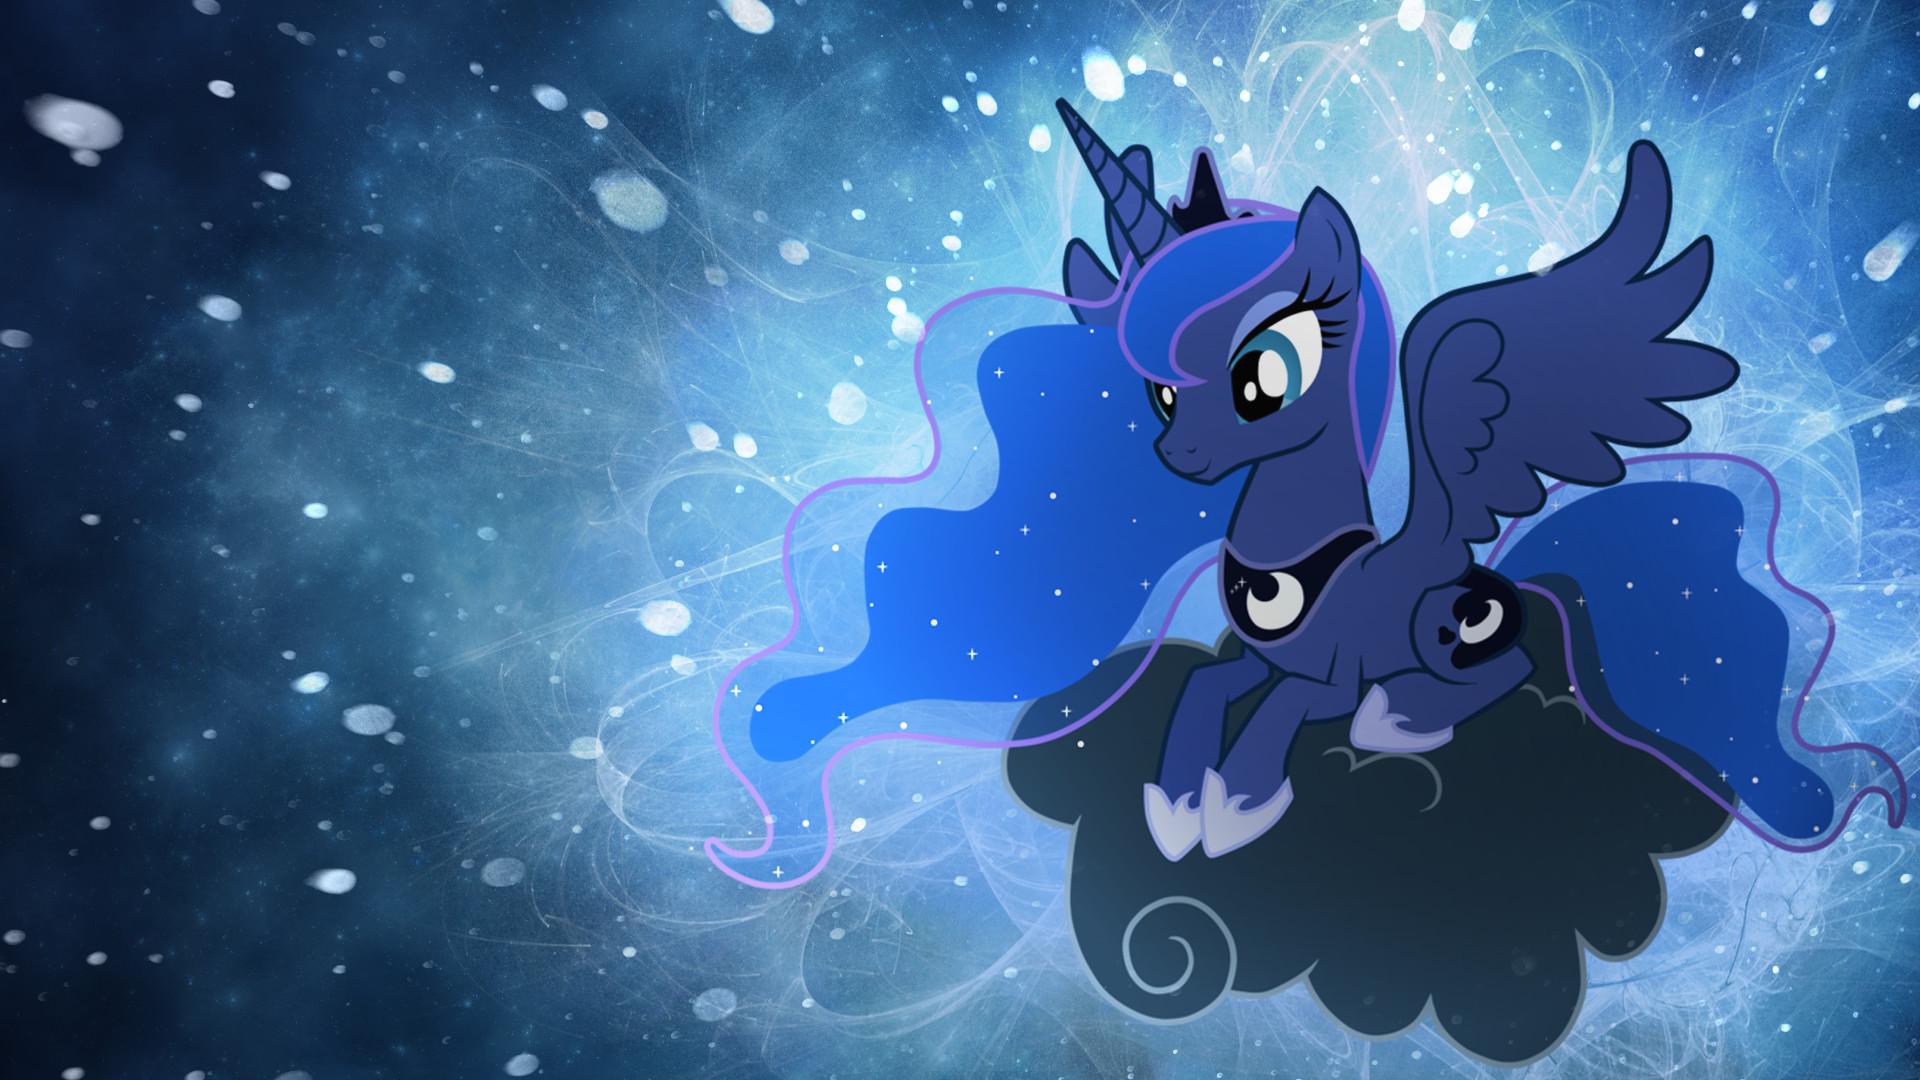 Princess Luna Wallpaper (88+ images)